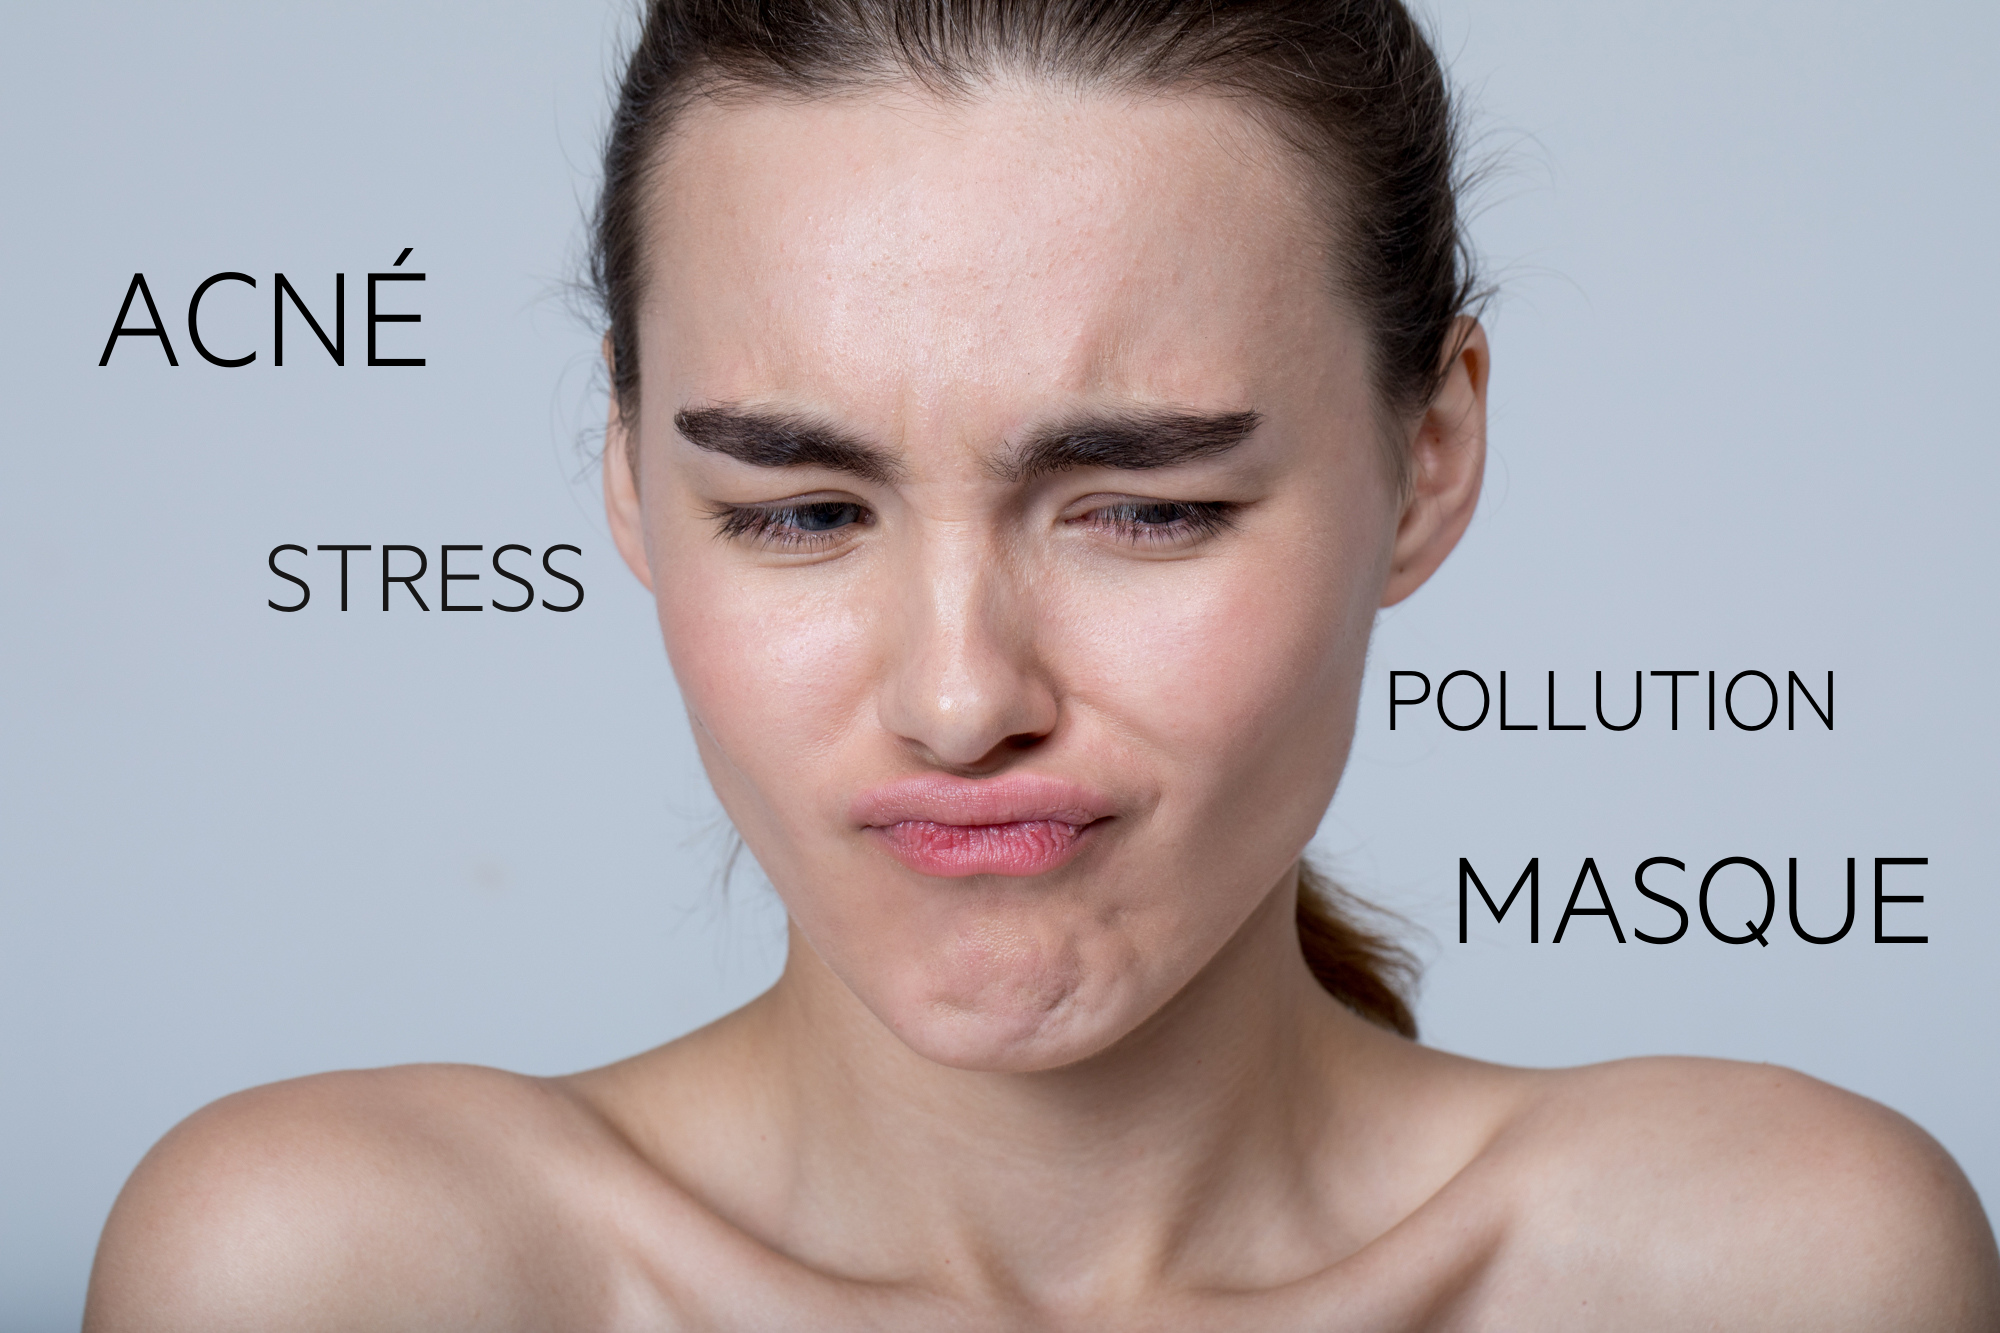 acne_masque_stress_fille